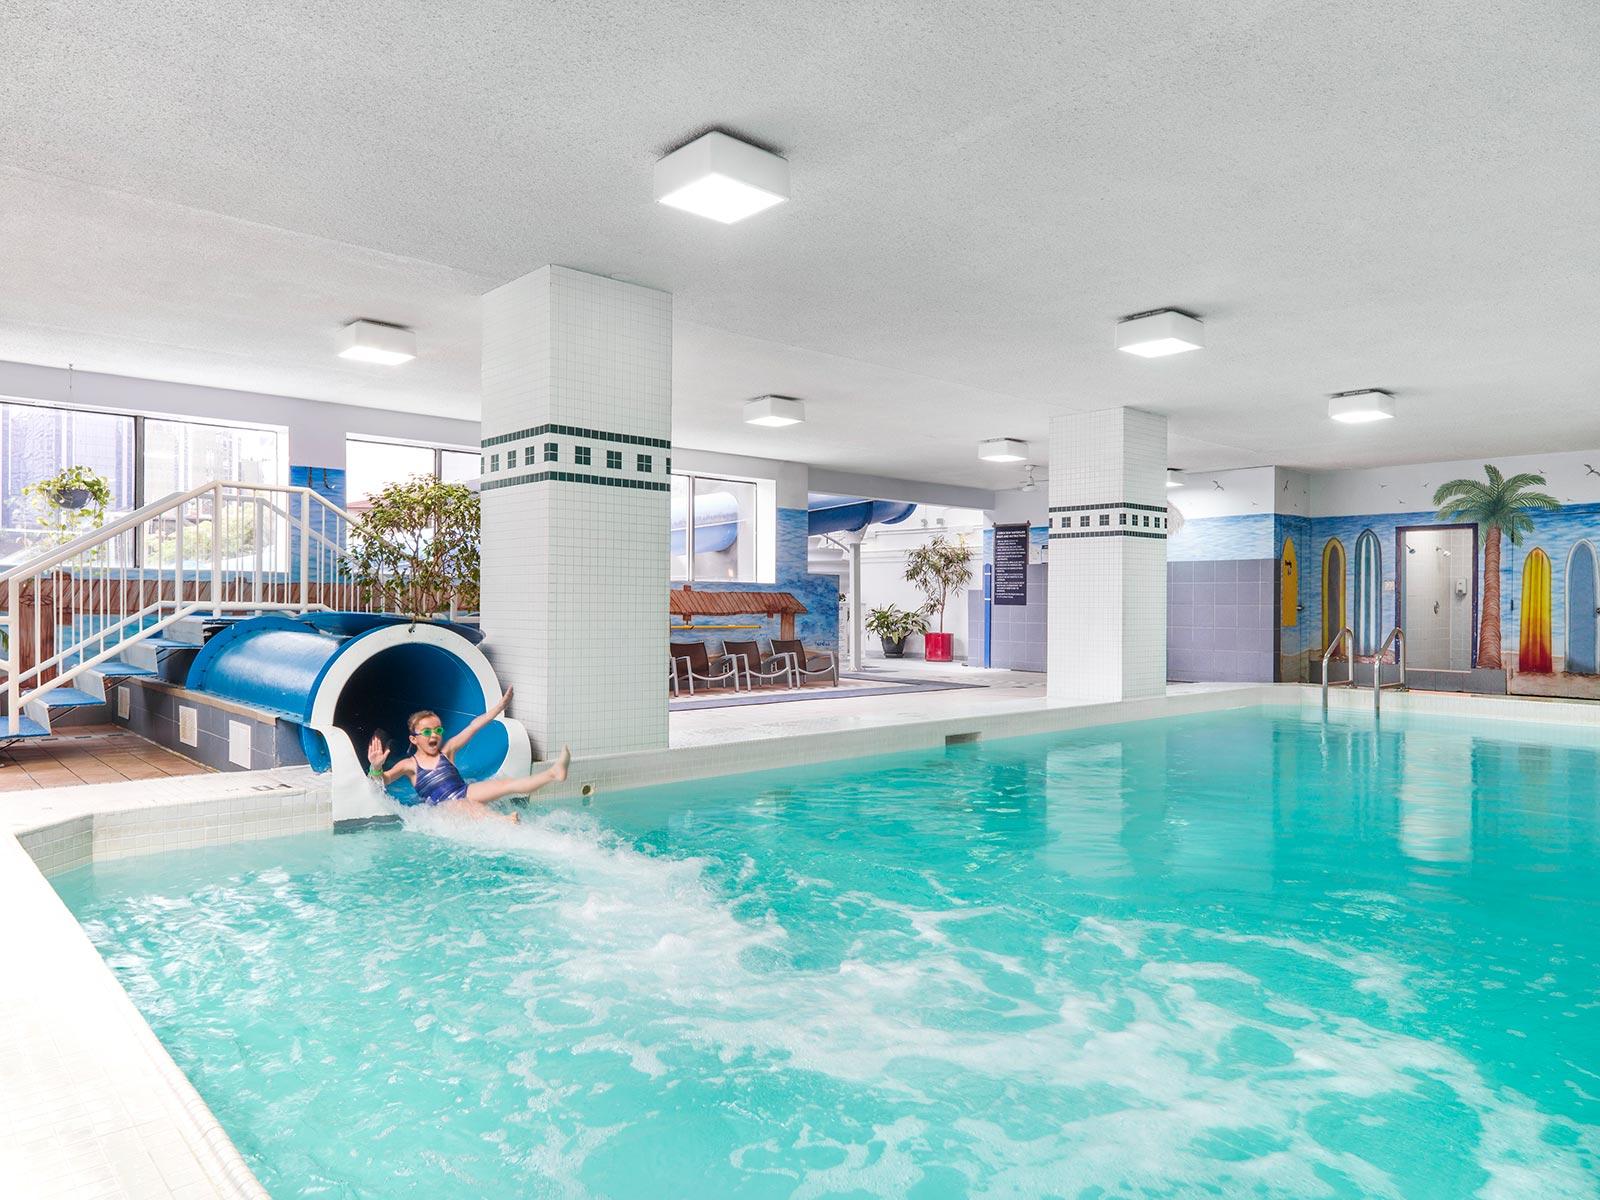 family-fun-zone-kids-pool-with-girl